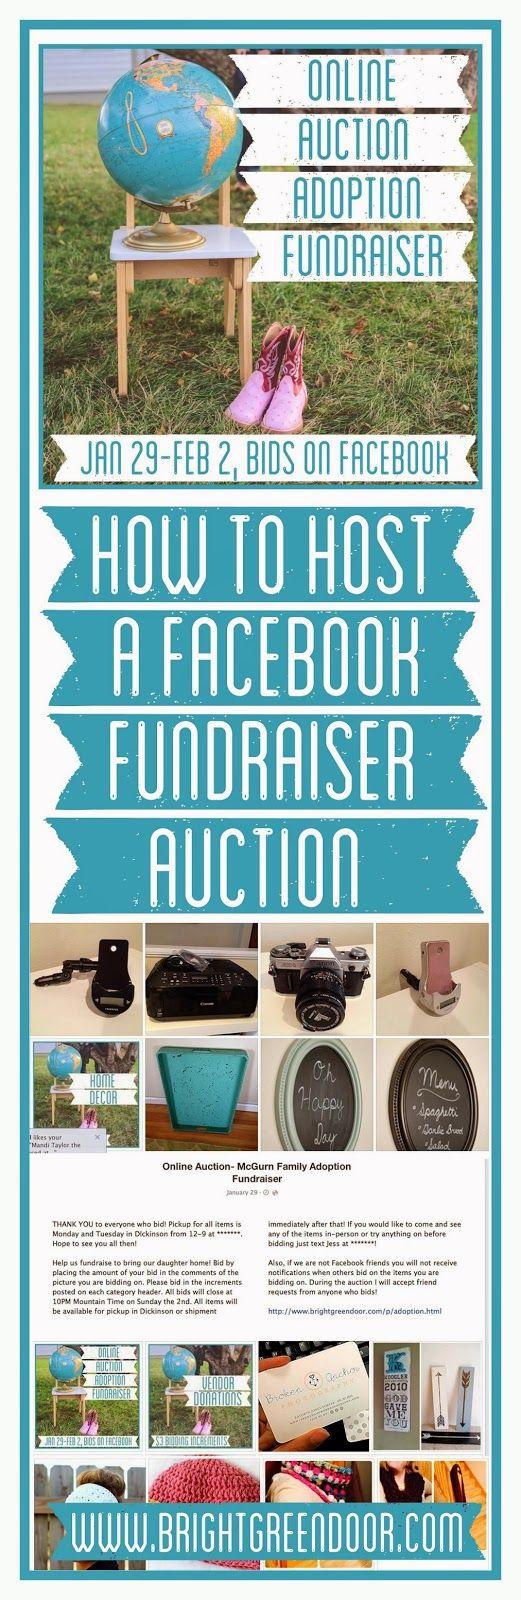 Online Facebook Auction Fundraiser